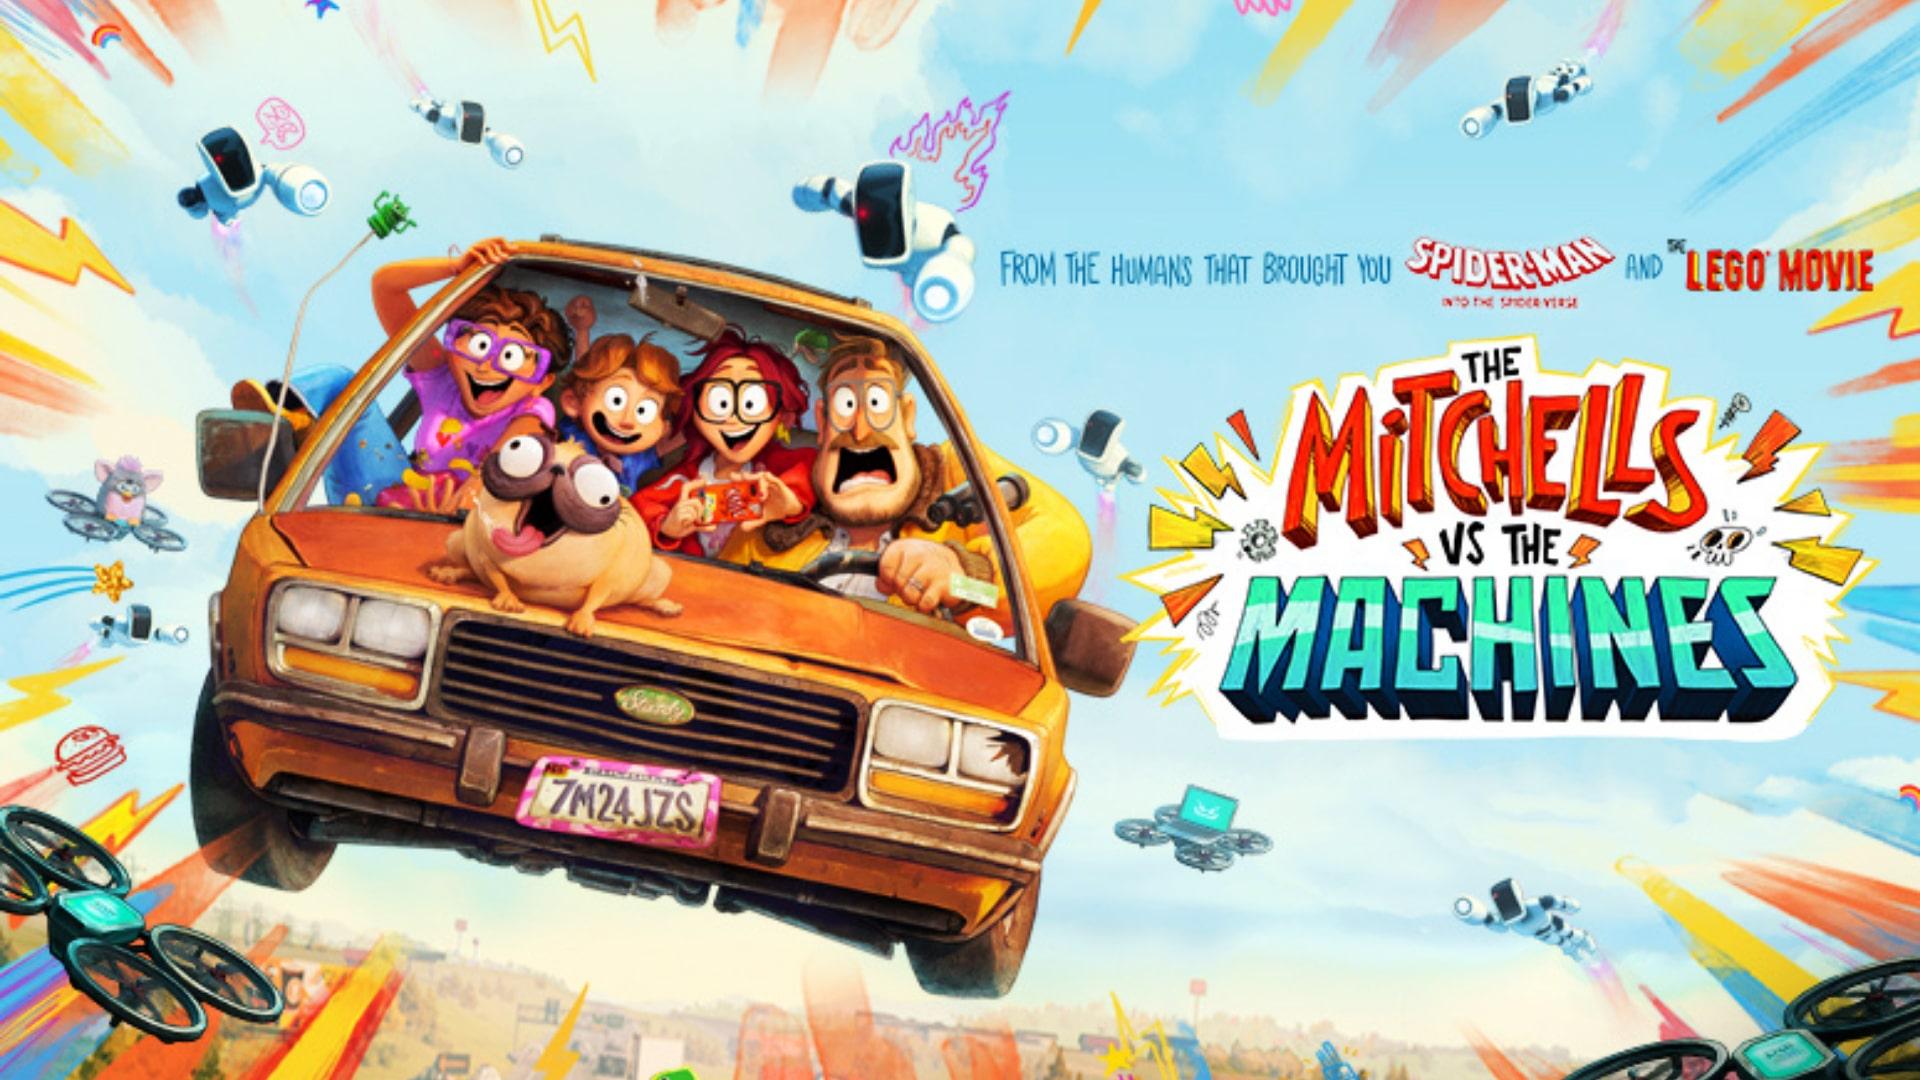 The-Mitchells-vs-The-Machines